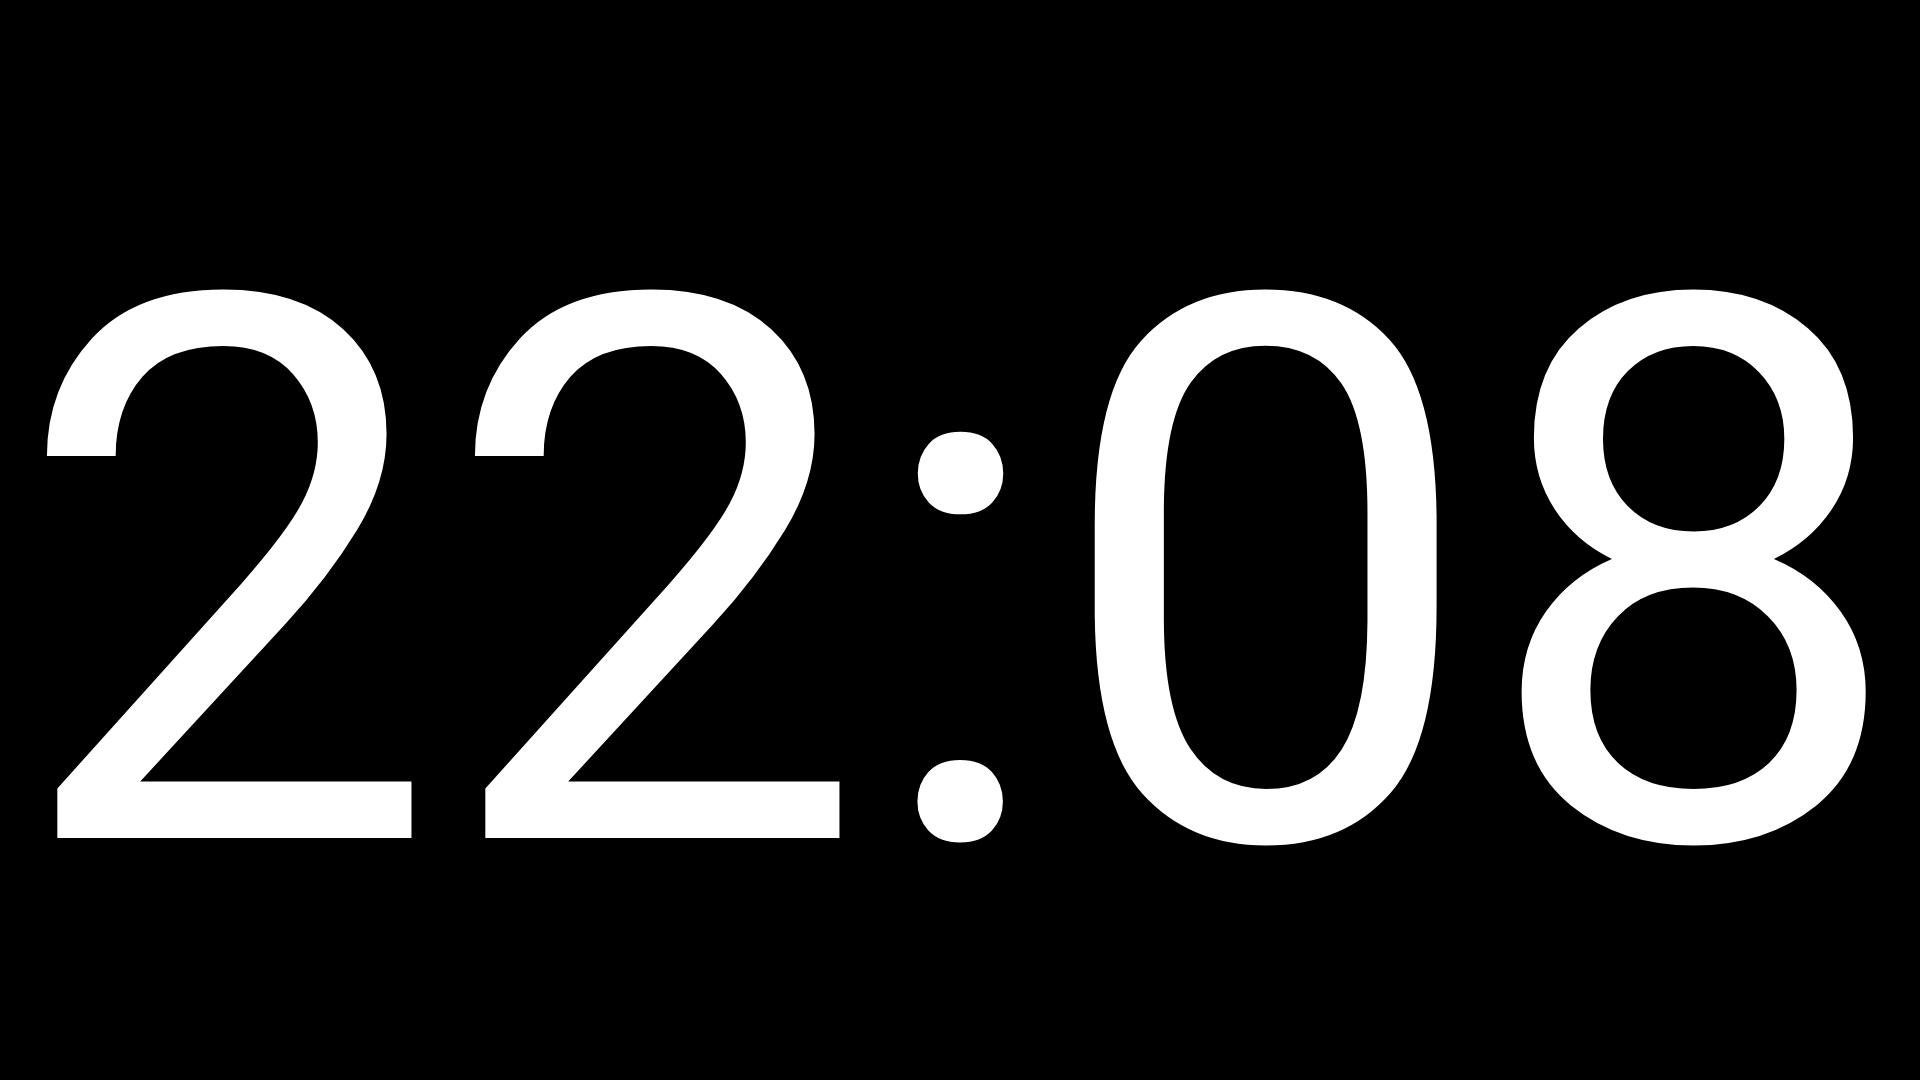 Big Clock Full Screen for Android - APK Download